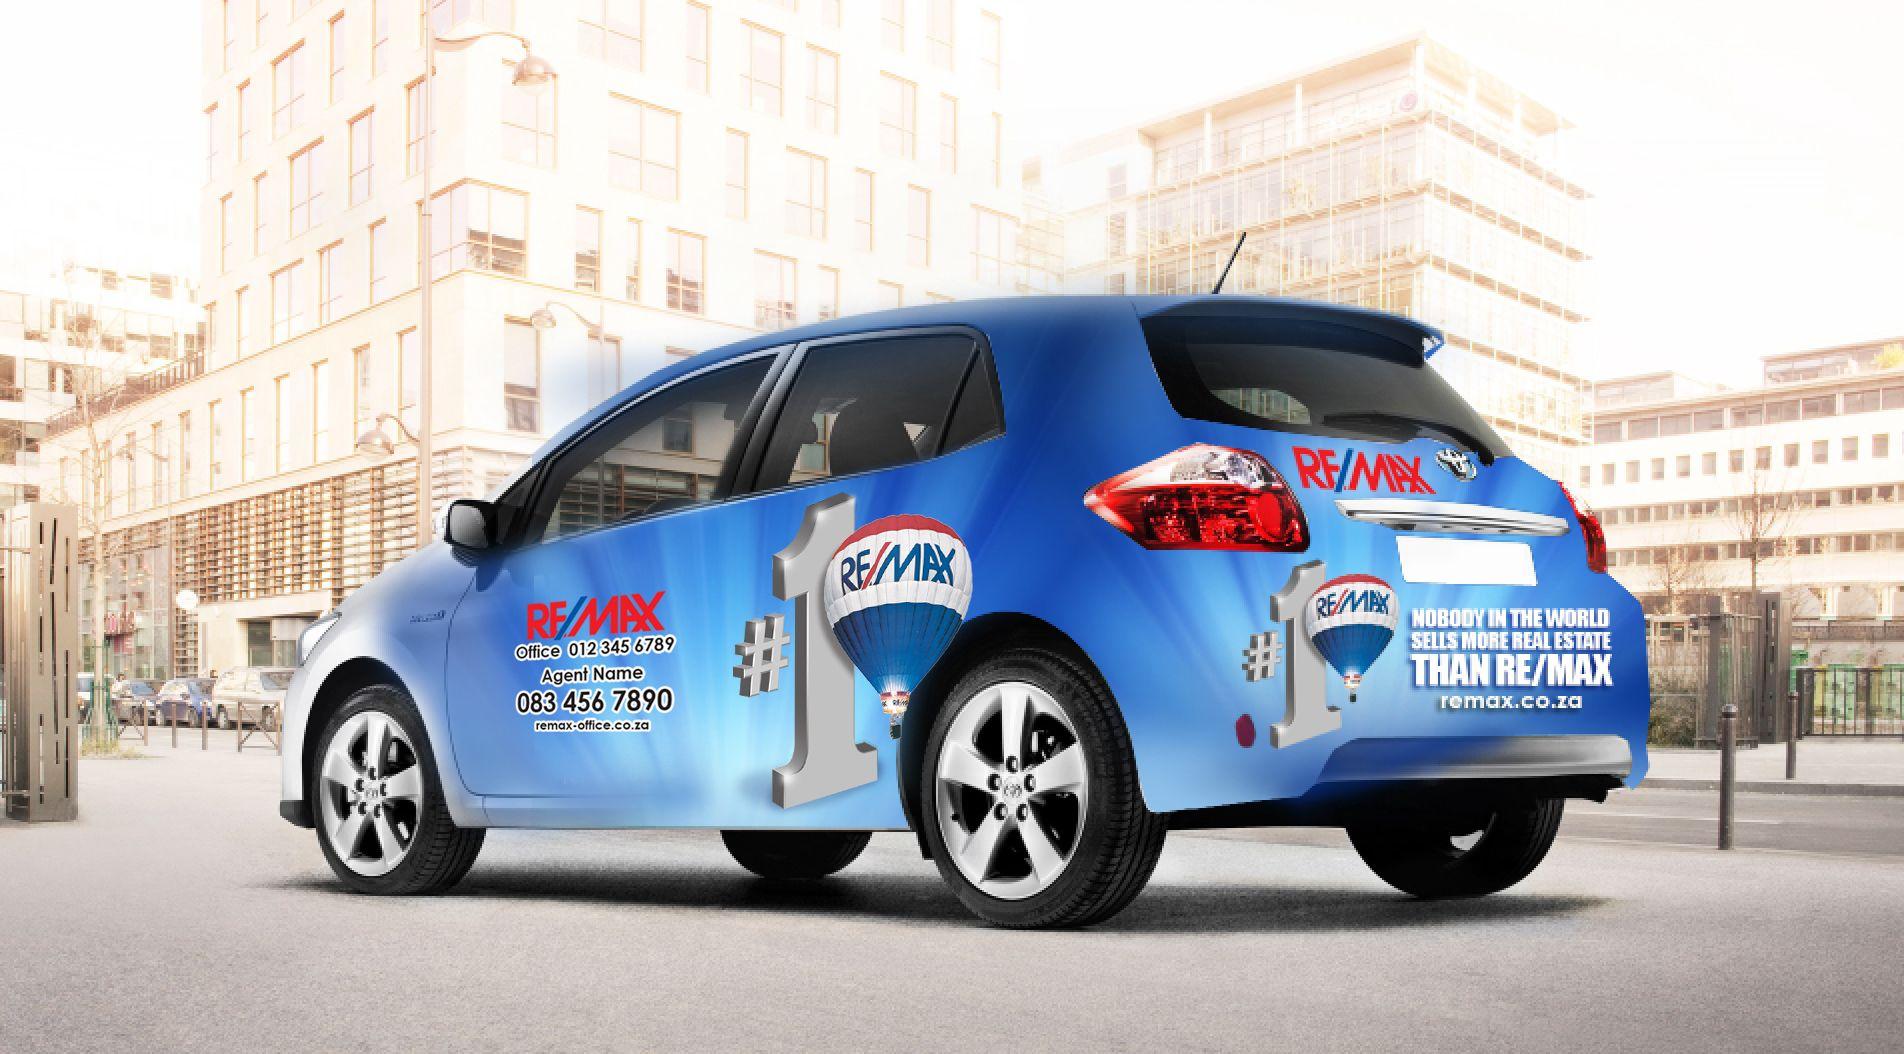 Full Vehicle Wrap Design Using Re Max No 1 Campaign Car Wrap Design Remax Car Wrap